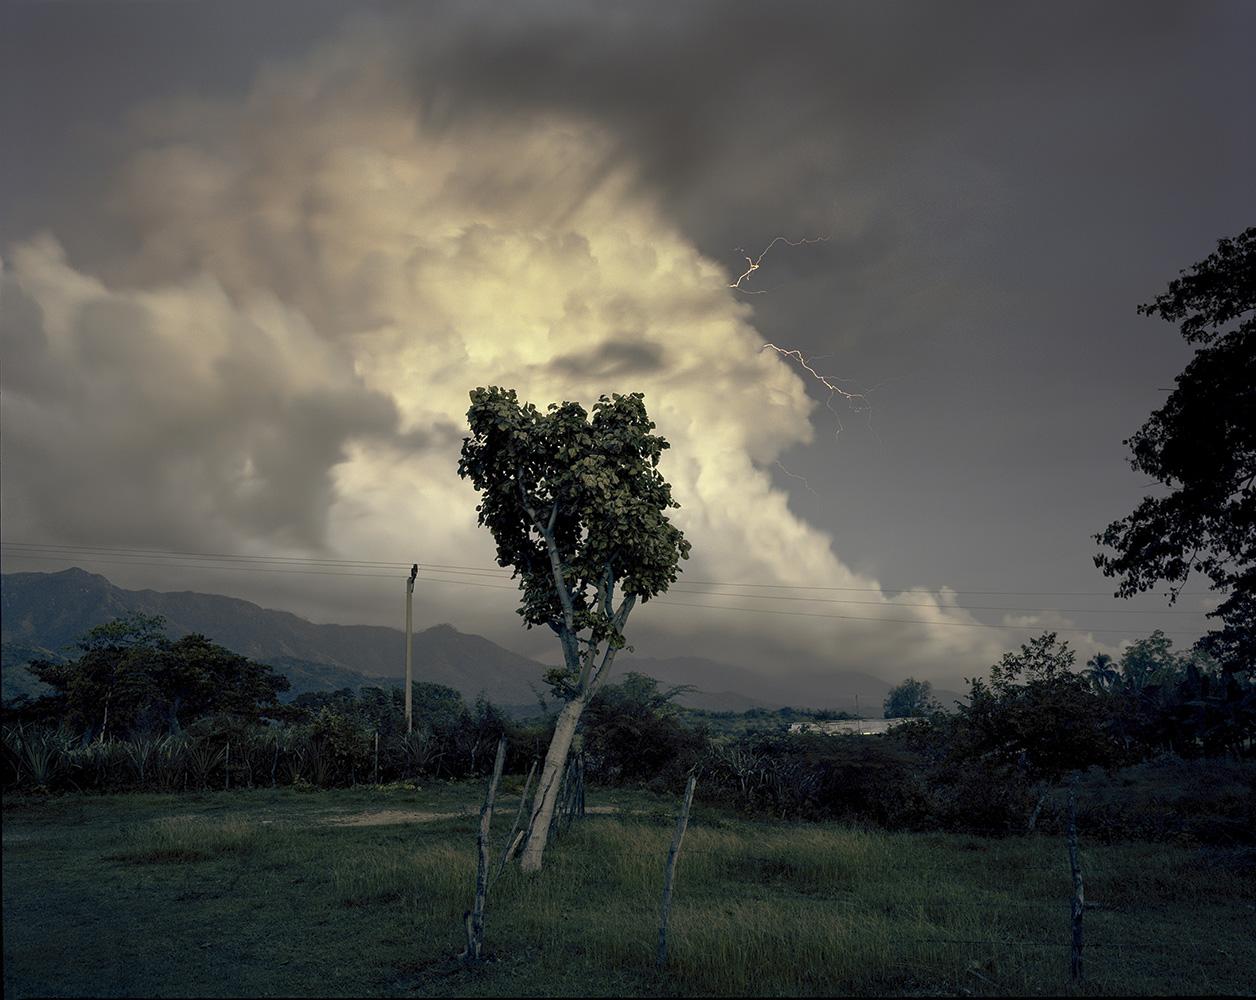 The landscape in El Brujo, Santiago de Cuba Province.